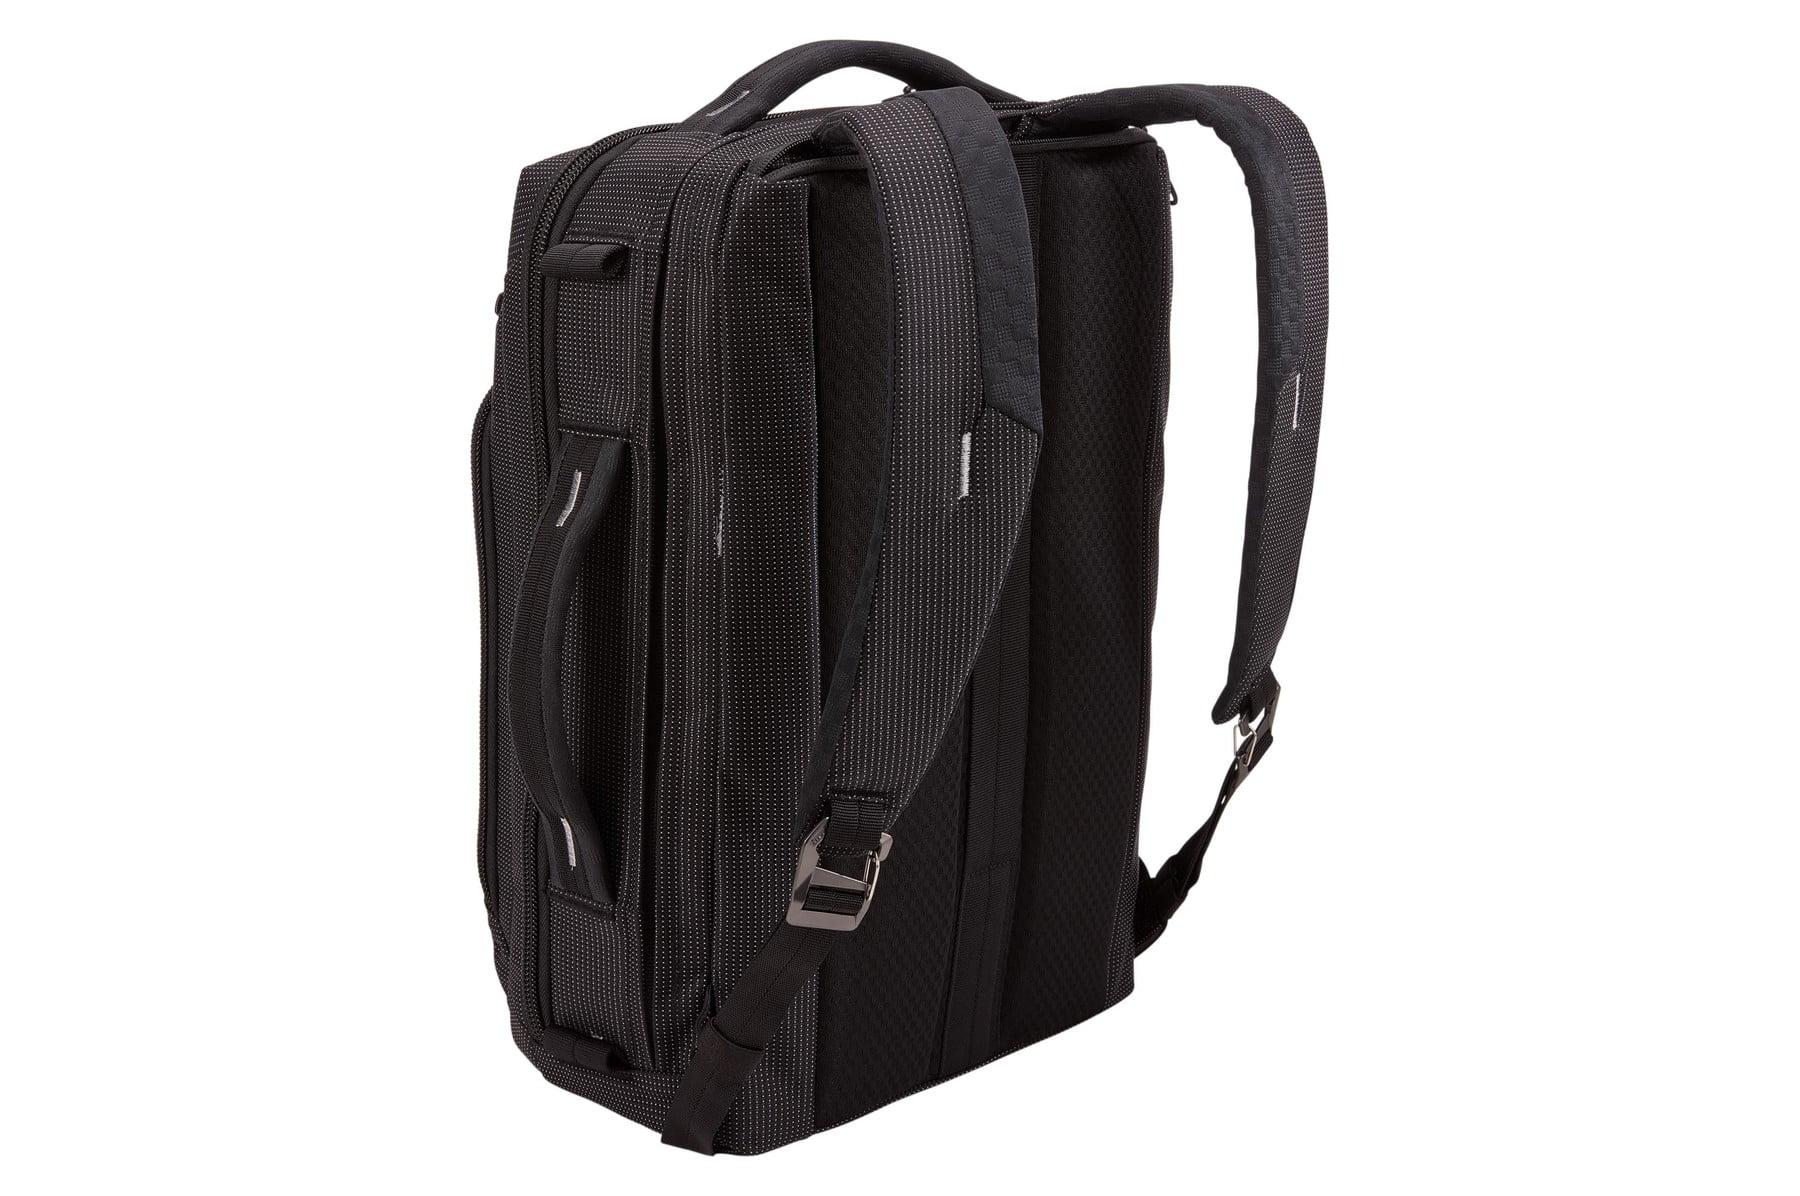 Geanta laptop Thule Crossover 2 Convertible Laptop Bag 15.6 inchi Black 2